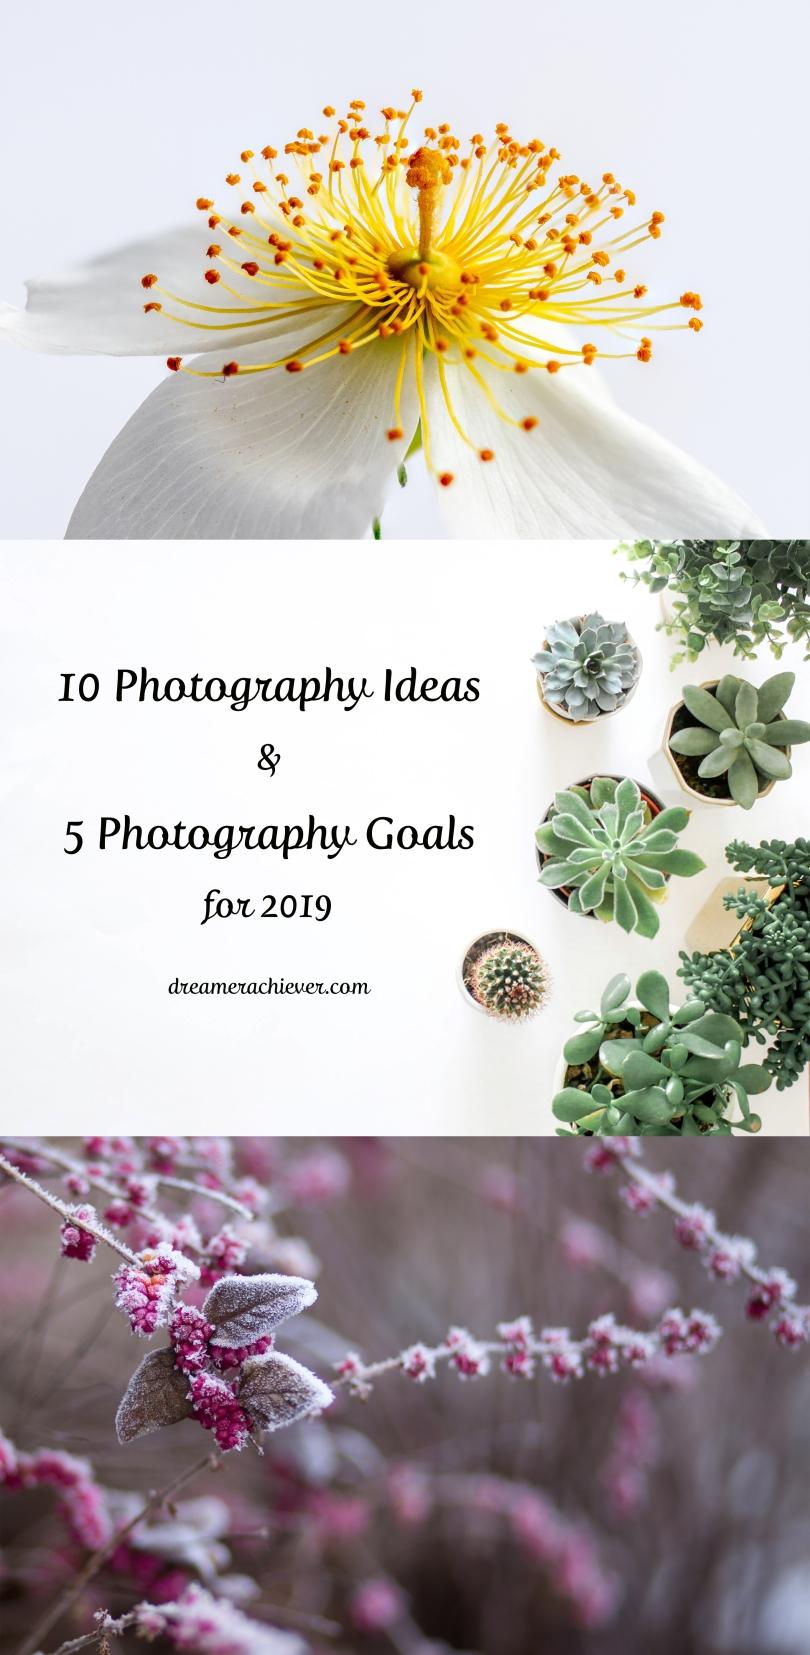 PhotographyIdeasandGoalsBlogPost